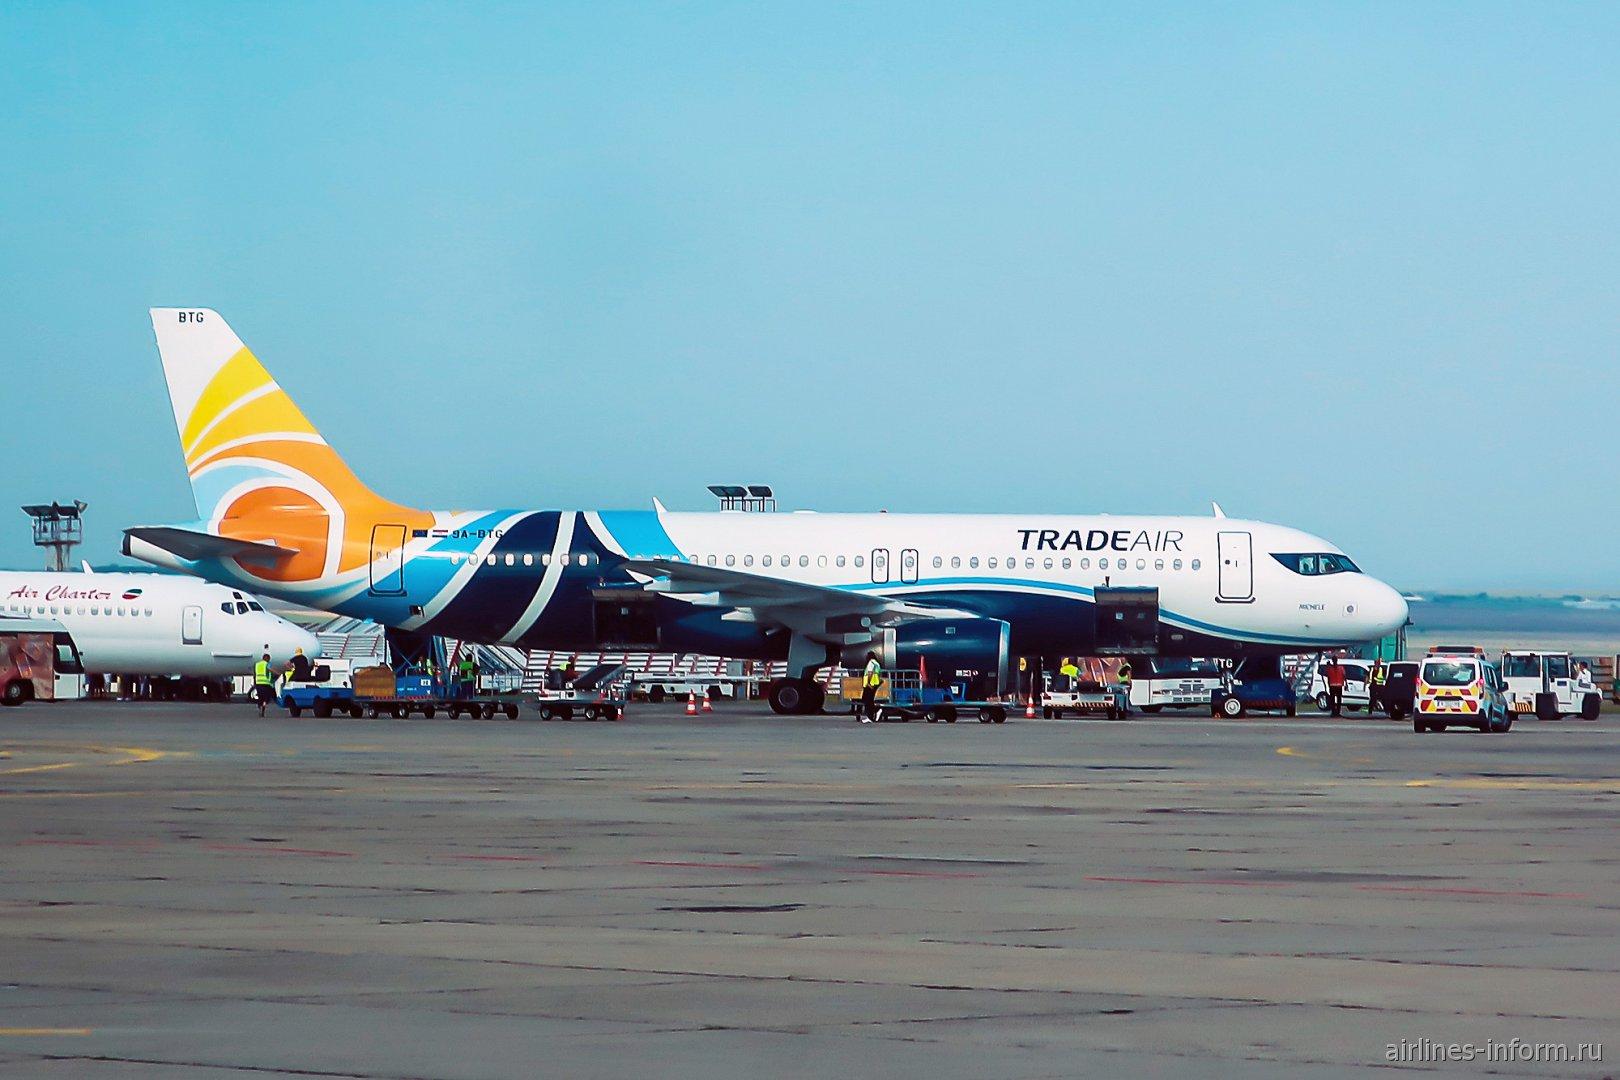 Авиалайнер Airbus A320 рег. номер 9A-BTG авиакомпании Trade Air из Хорватии